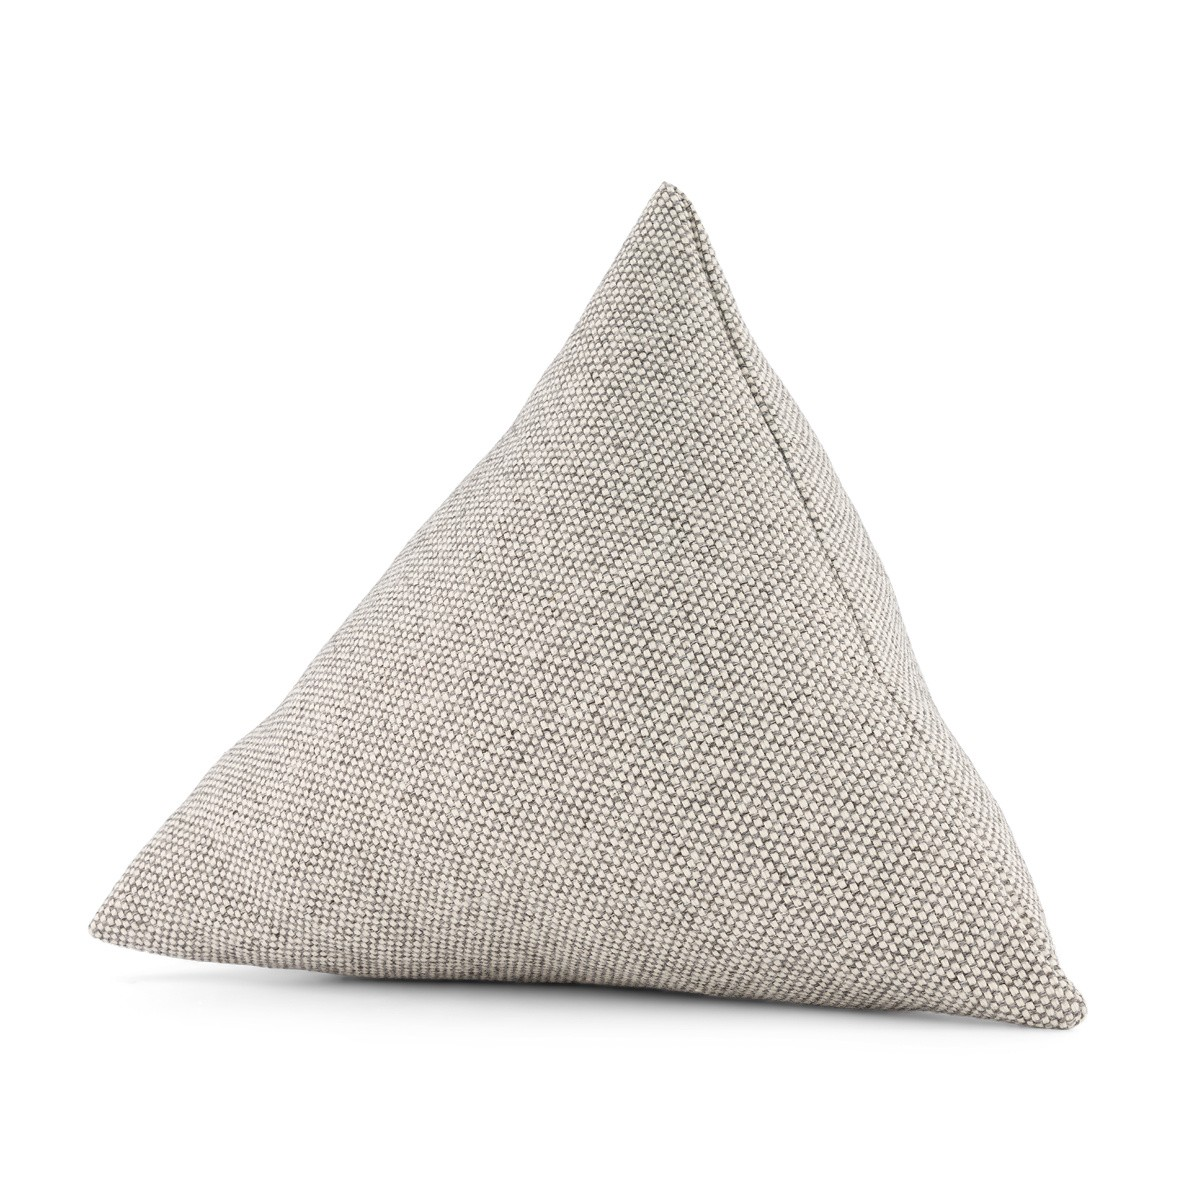 Divino Cushion, Mottled Grey